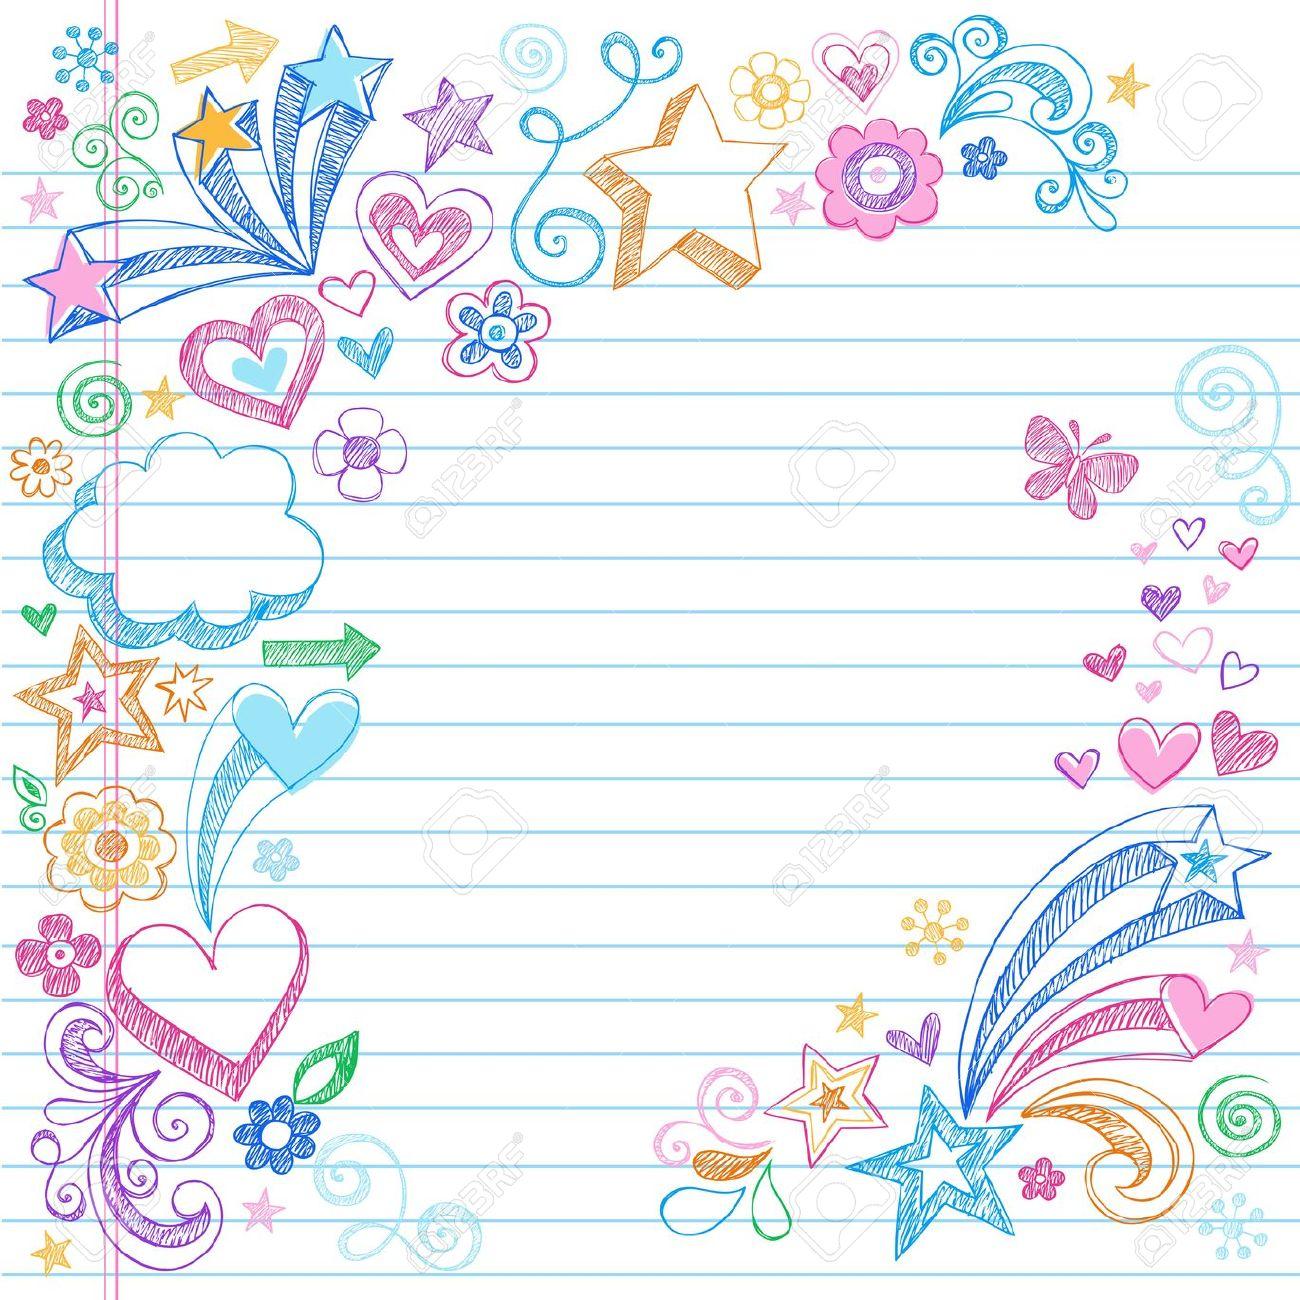 cute notebook paper clipart - Clipground